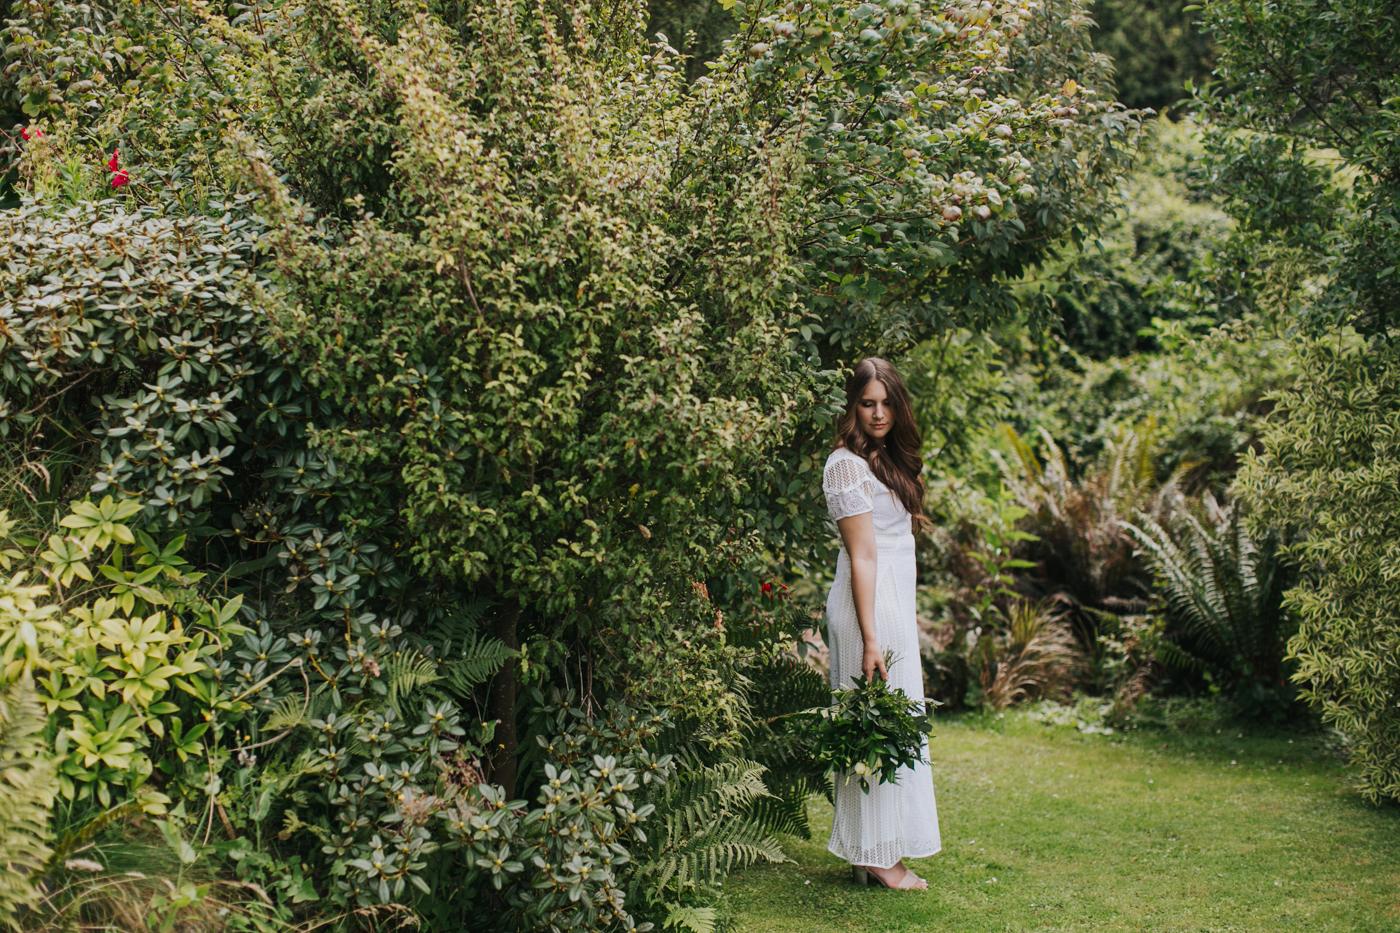 Ariana & Tim - Dunedin, New Zealand Wedding - Destination Wedding - Samantha Heather Photography-62.jpg